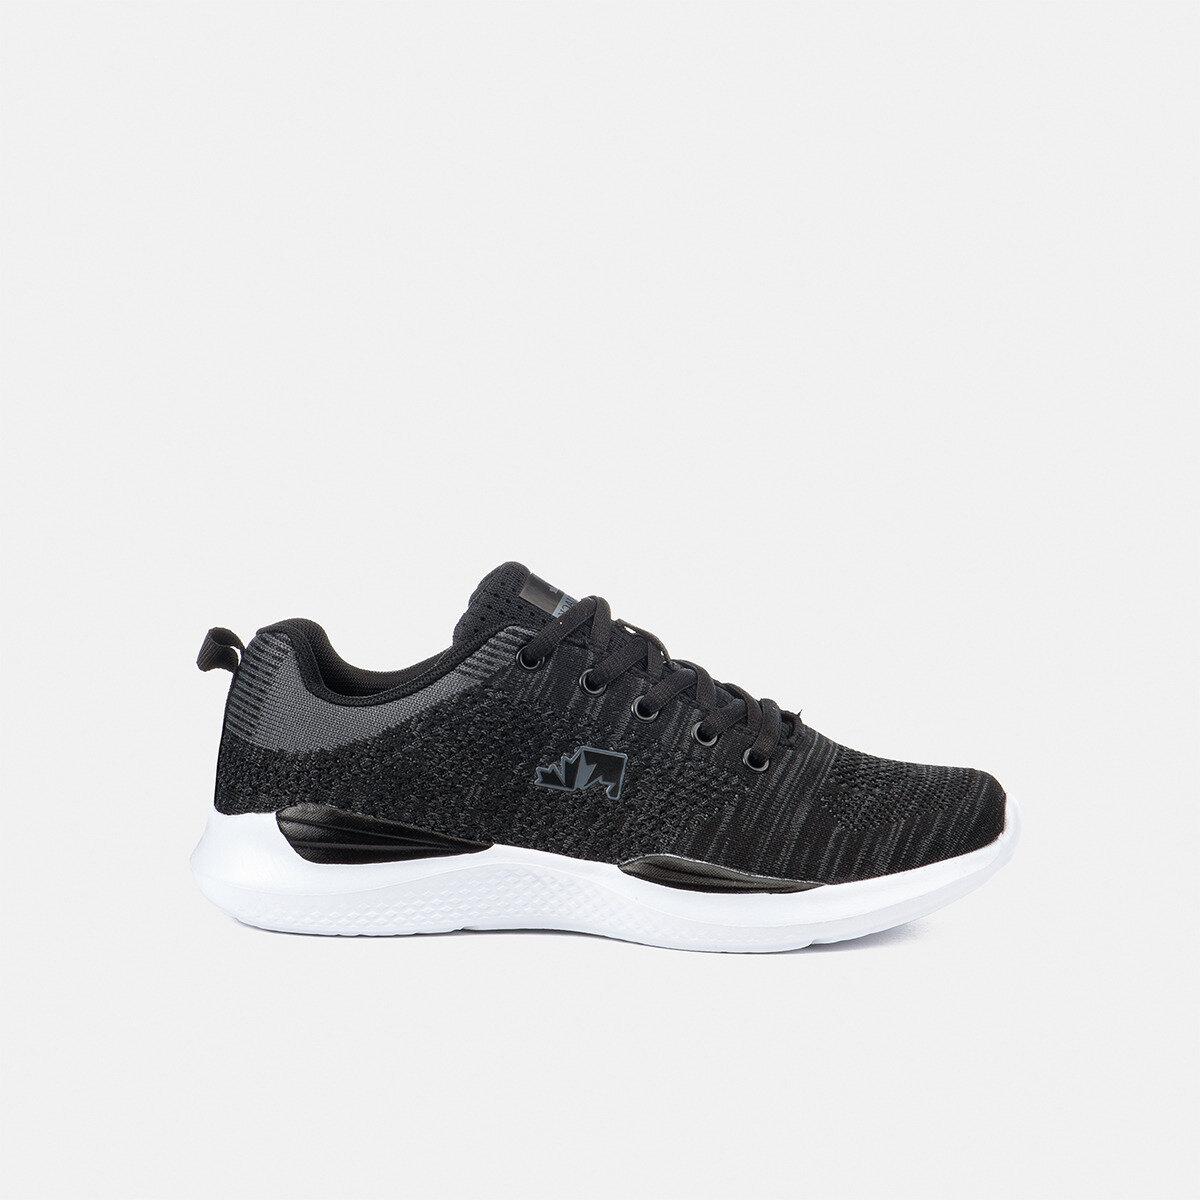 WALKY BLACK/DK GREY Woman Running shoes